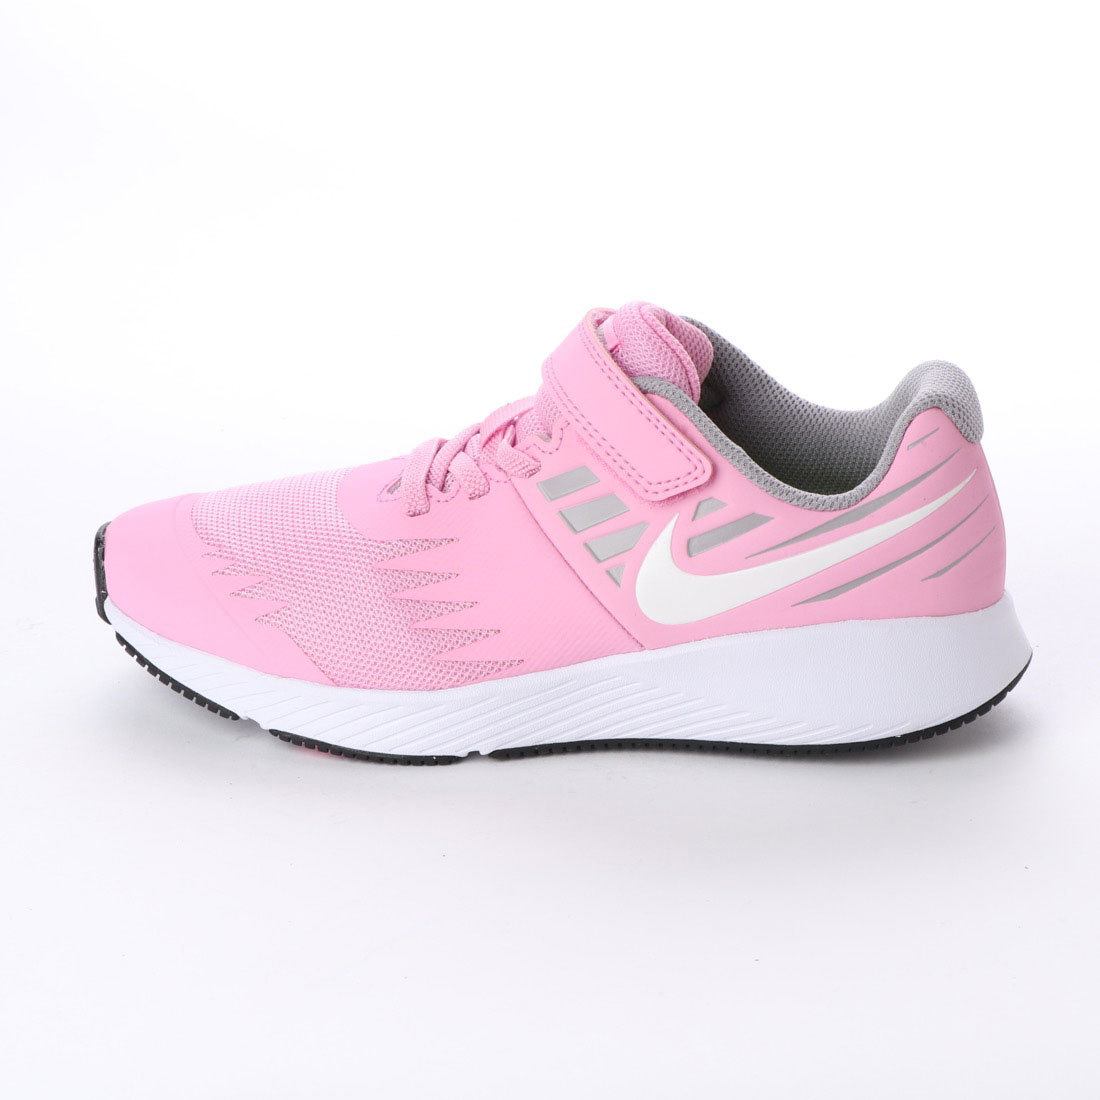 Nike Bimba Rosa Junior • Jobcalzature negozio dedicato